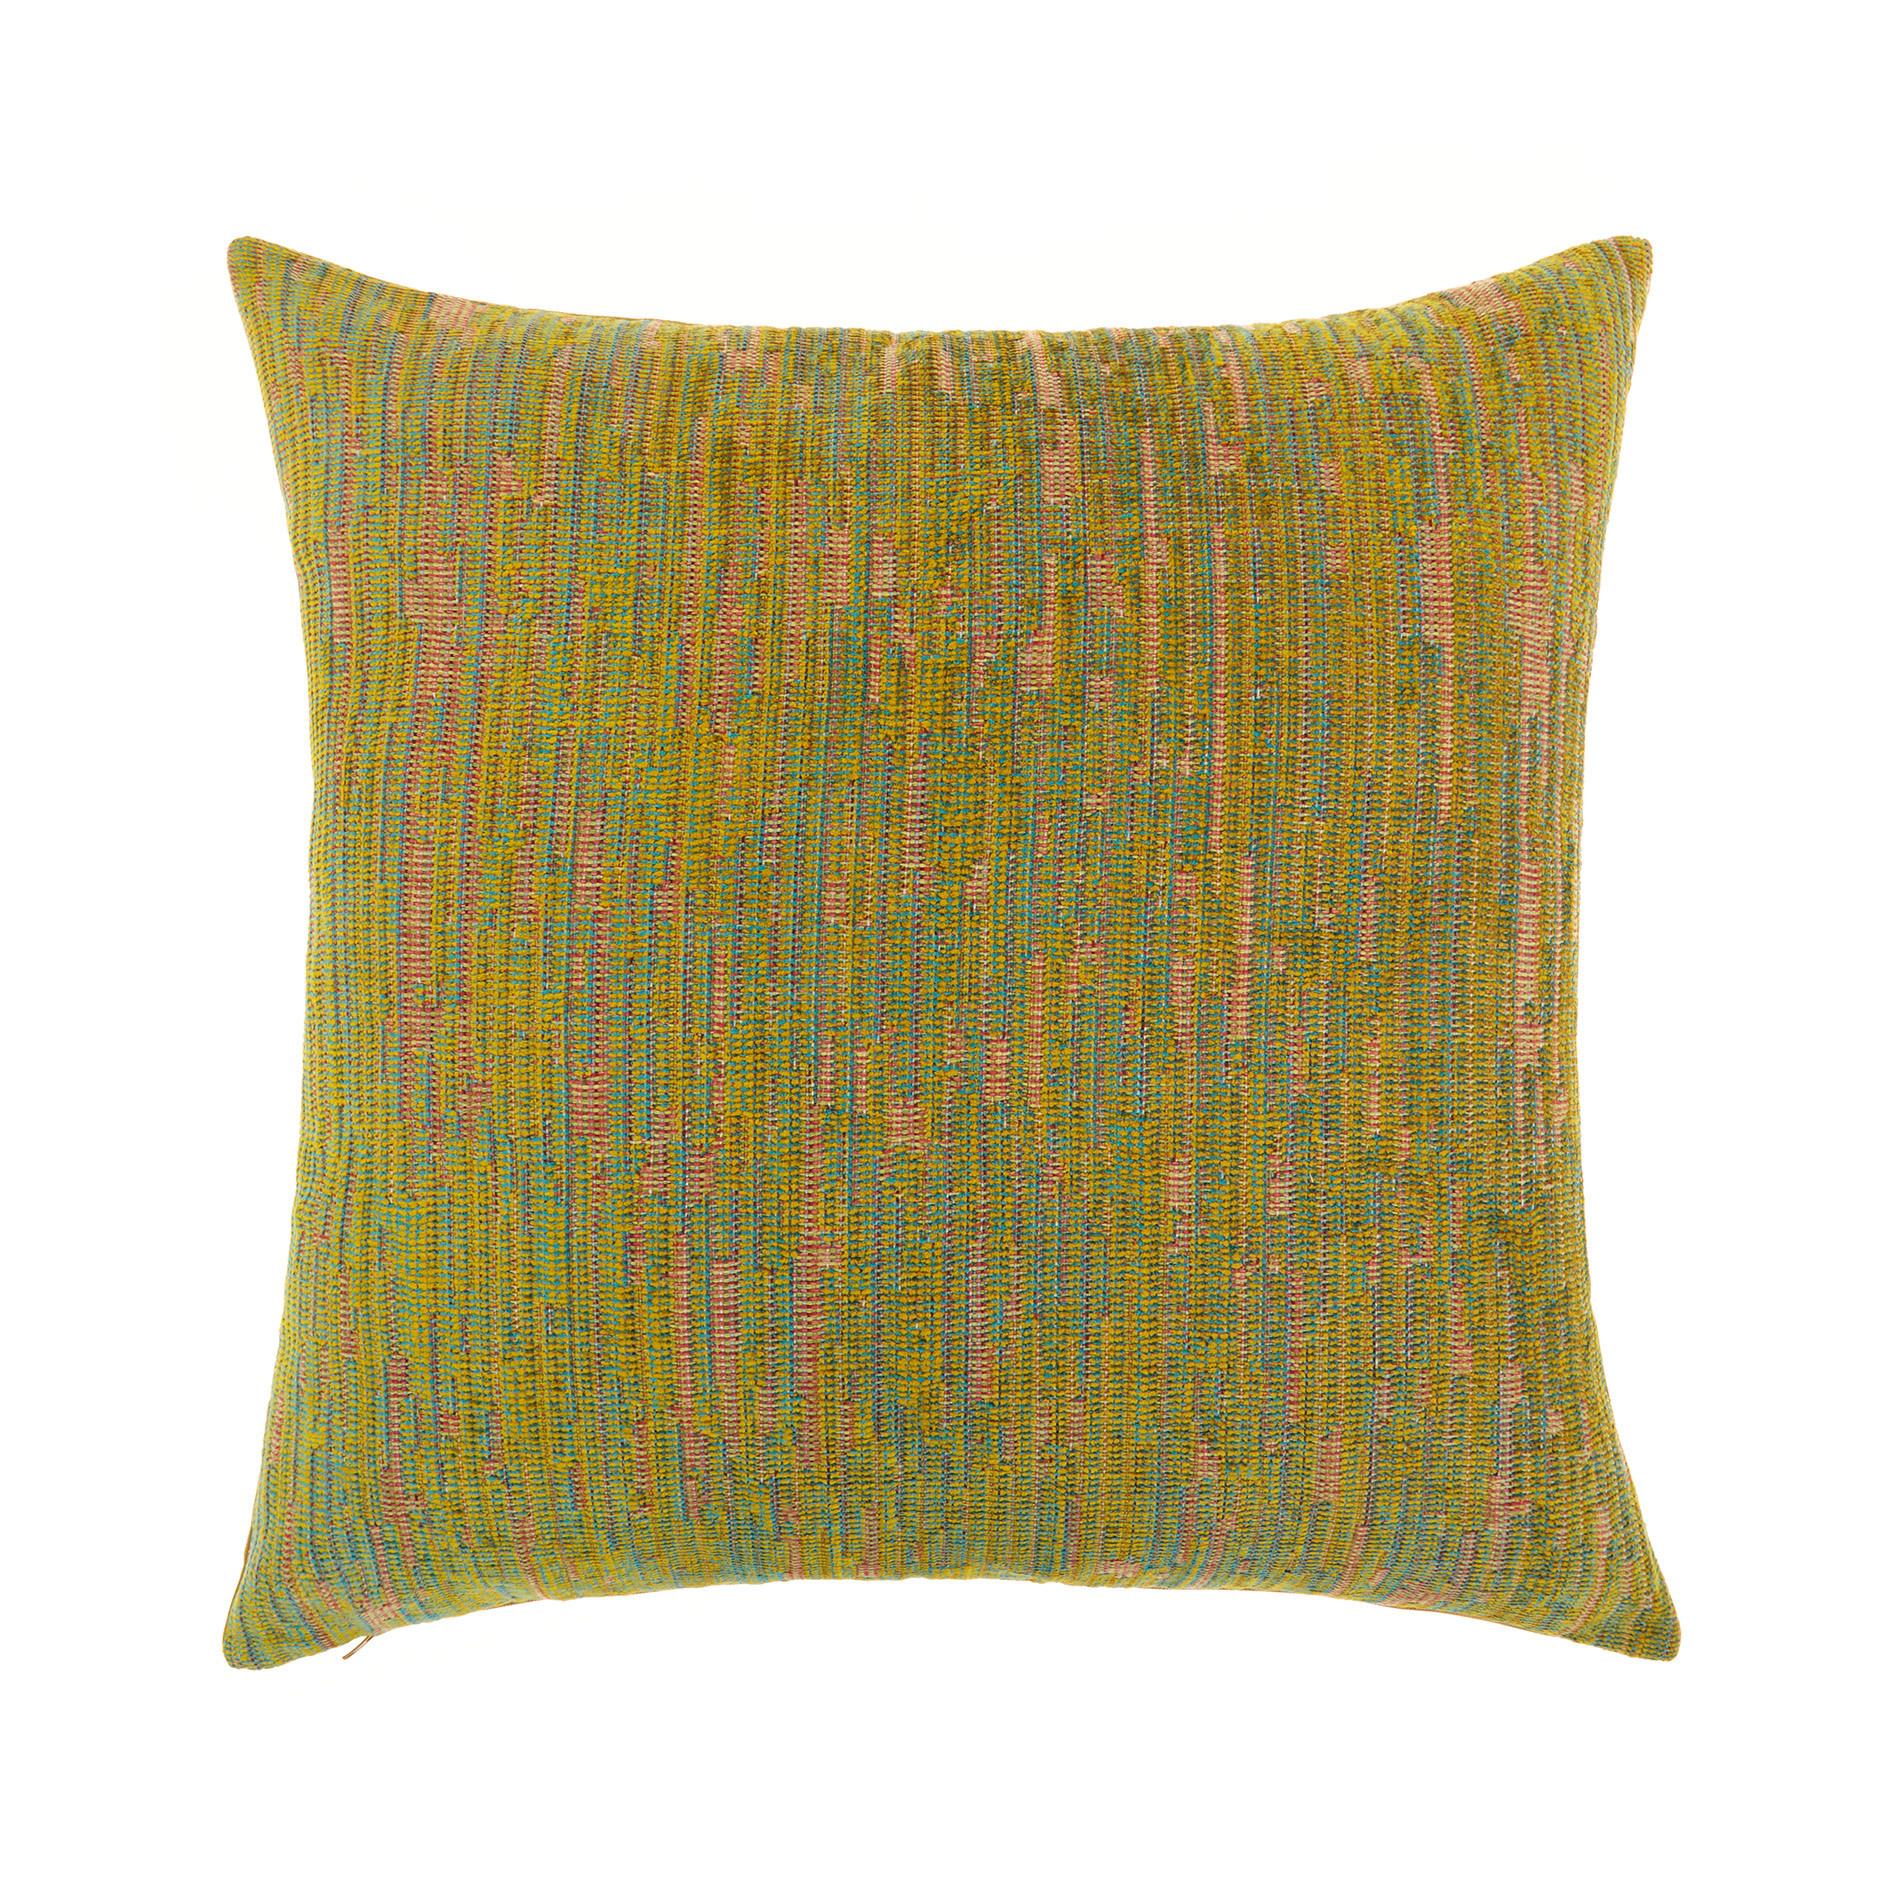 Cuscino jacquard motivo multicolore 50x50cm, Giallo senape, large image number 0